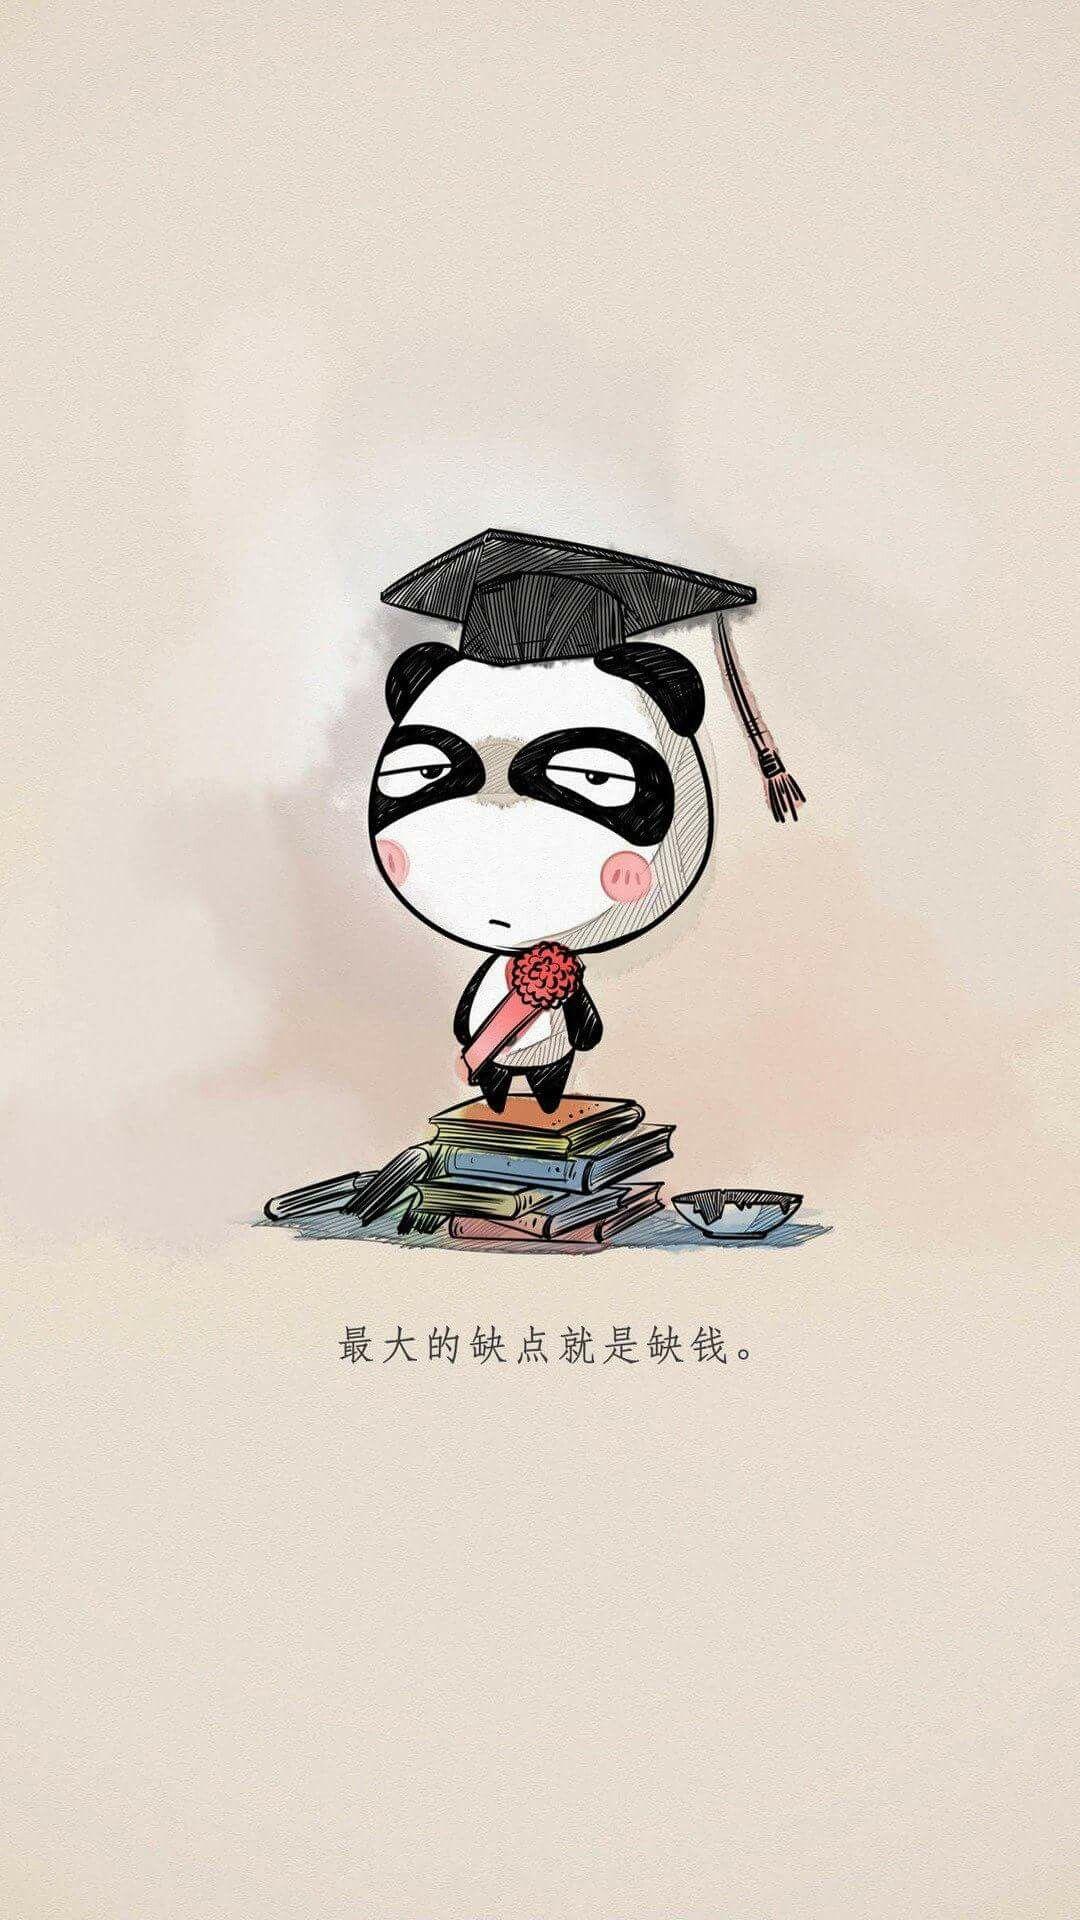 Pin By Noorseenali Ali On Panda Graduation Drawing Graduation Art Personalized Graduation Gifts